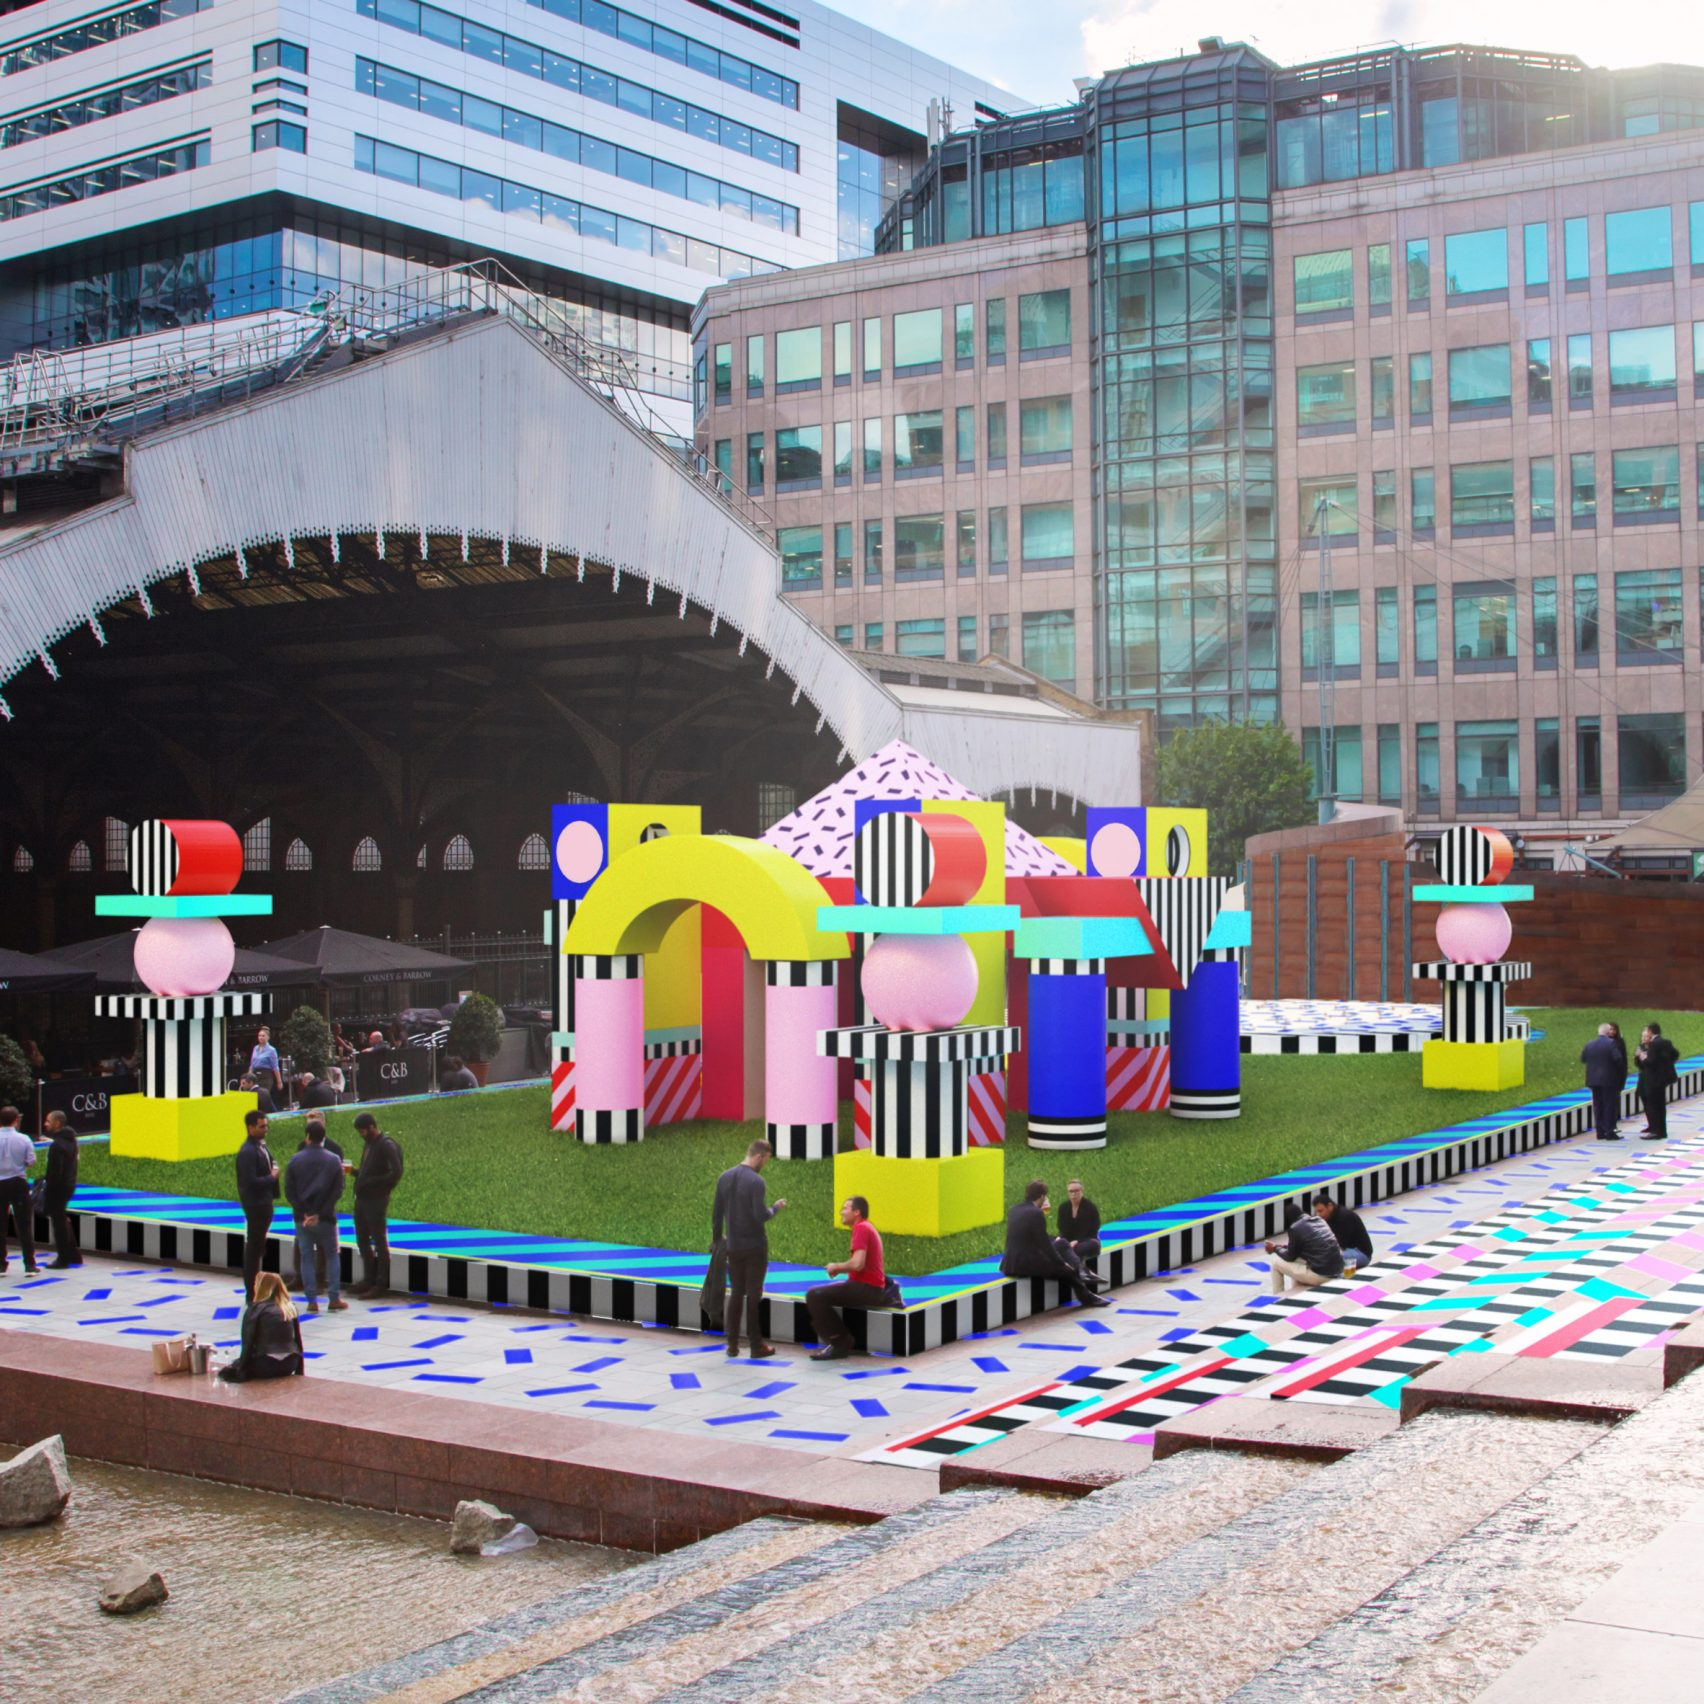 London Design Festival 2017 installations